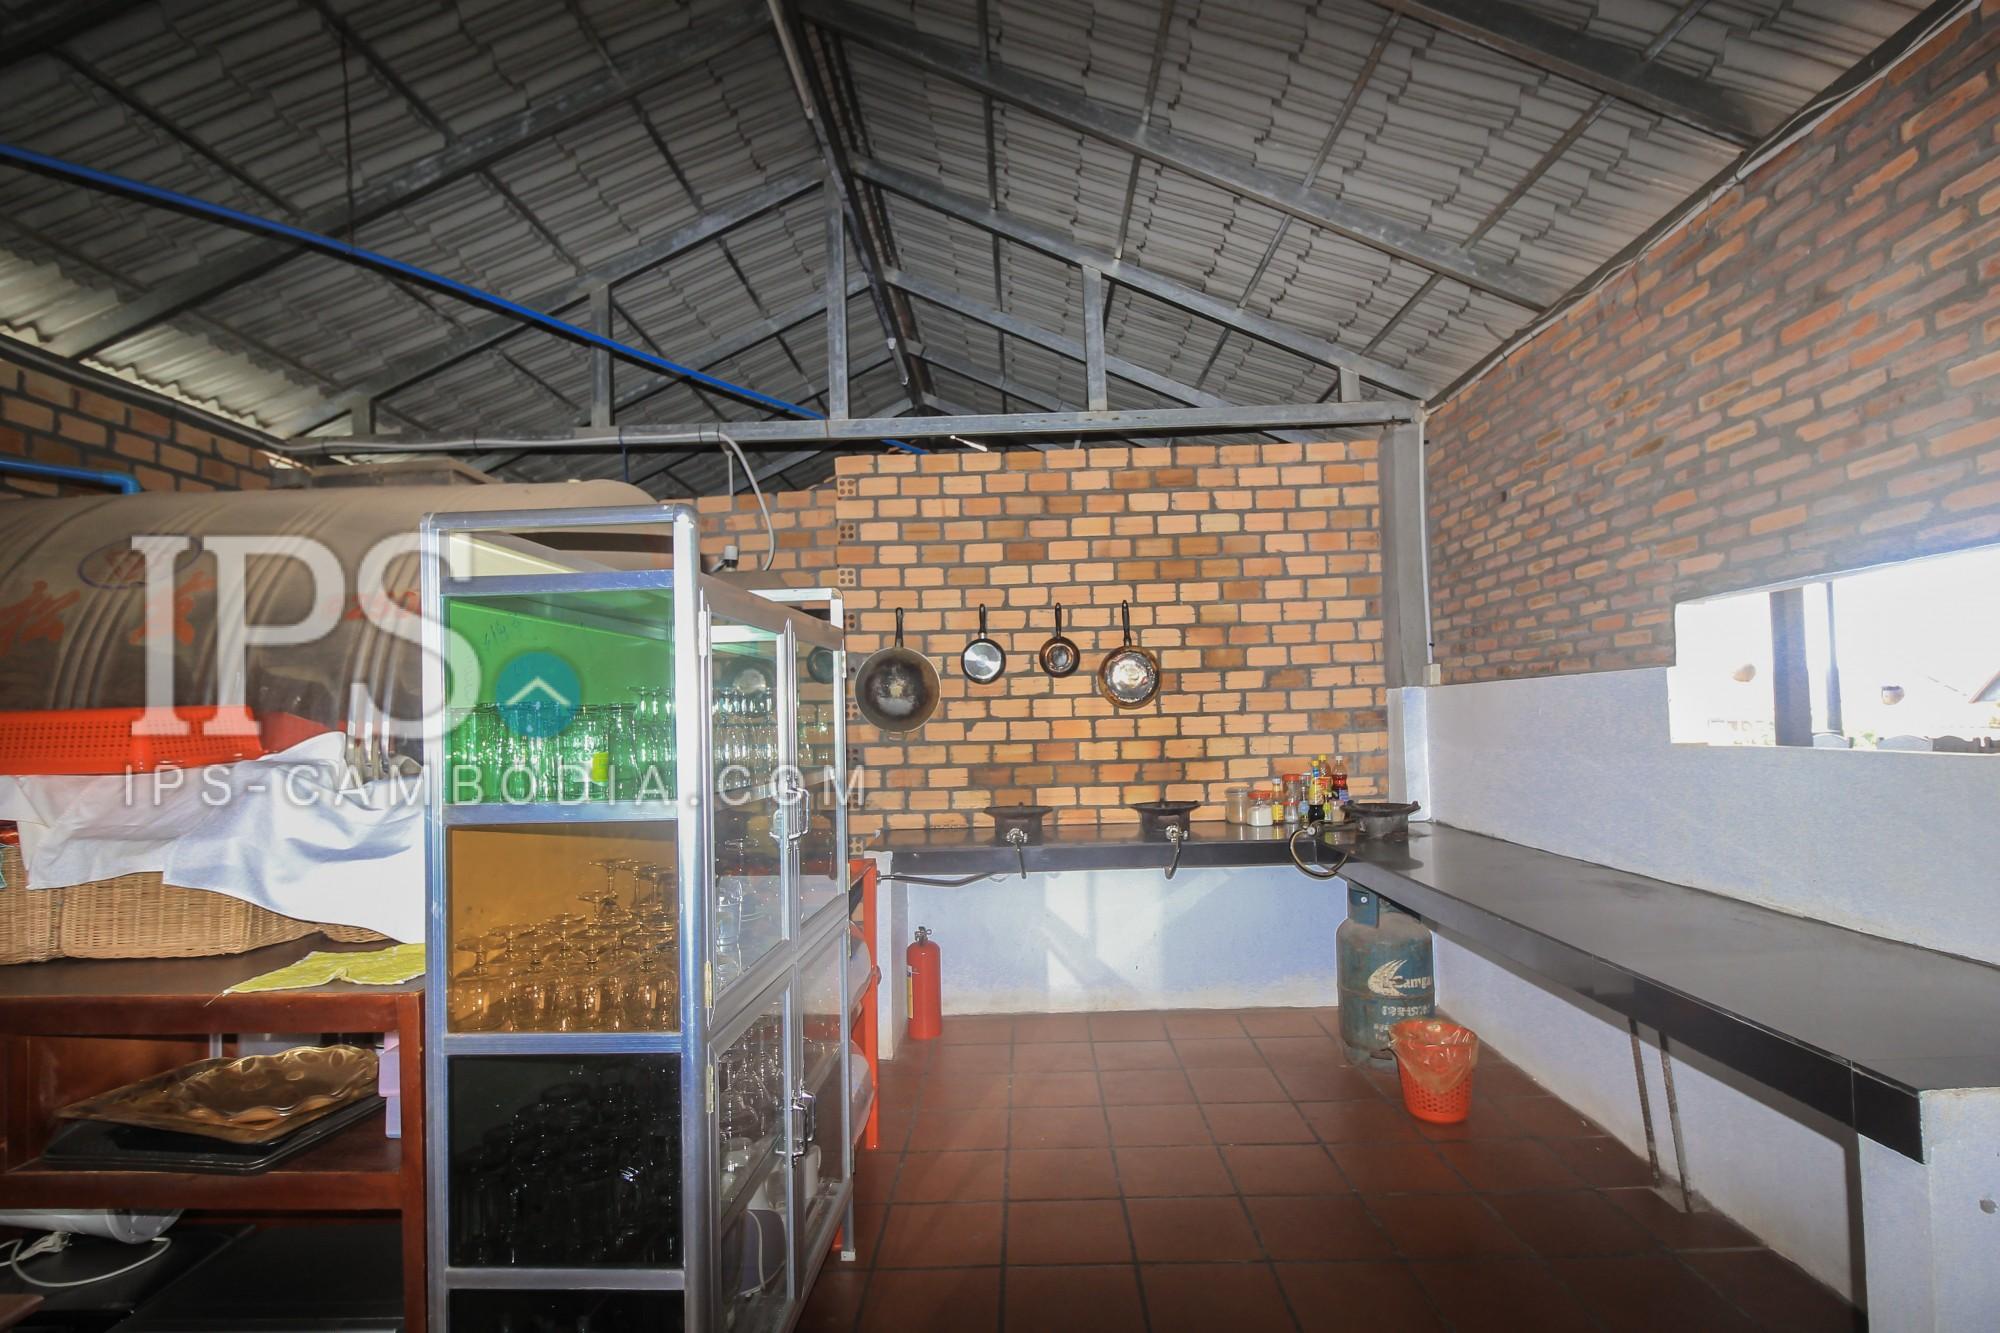 19 Bedroom Boutique Hotel for Rent - Siem Reap